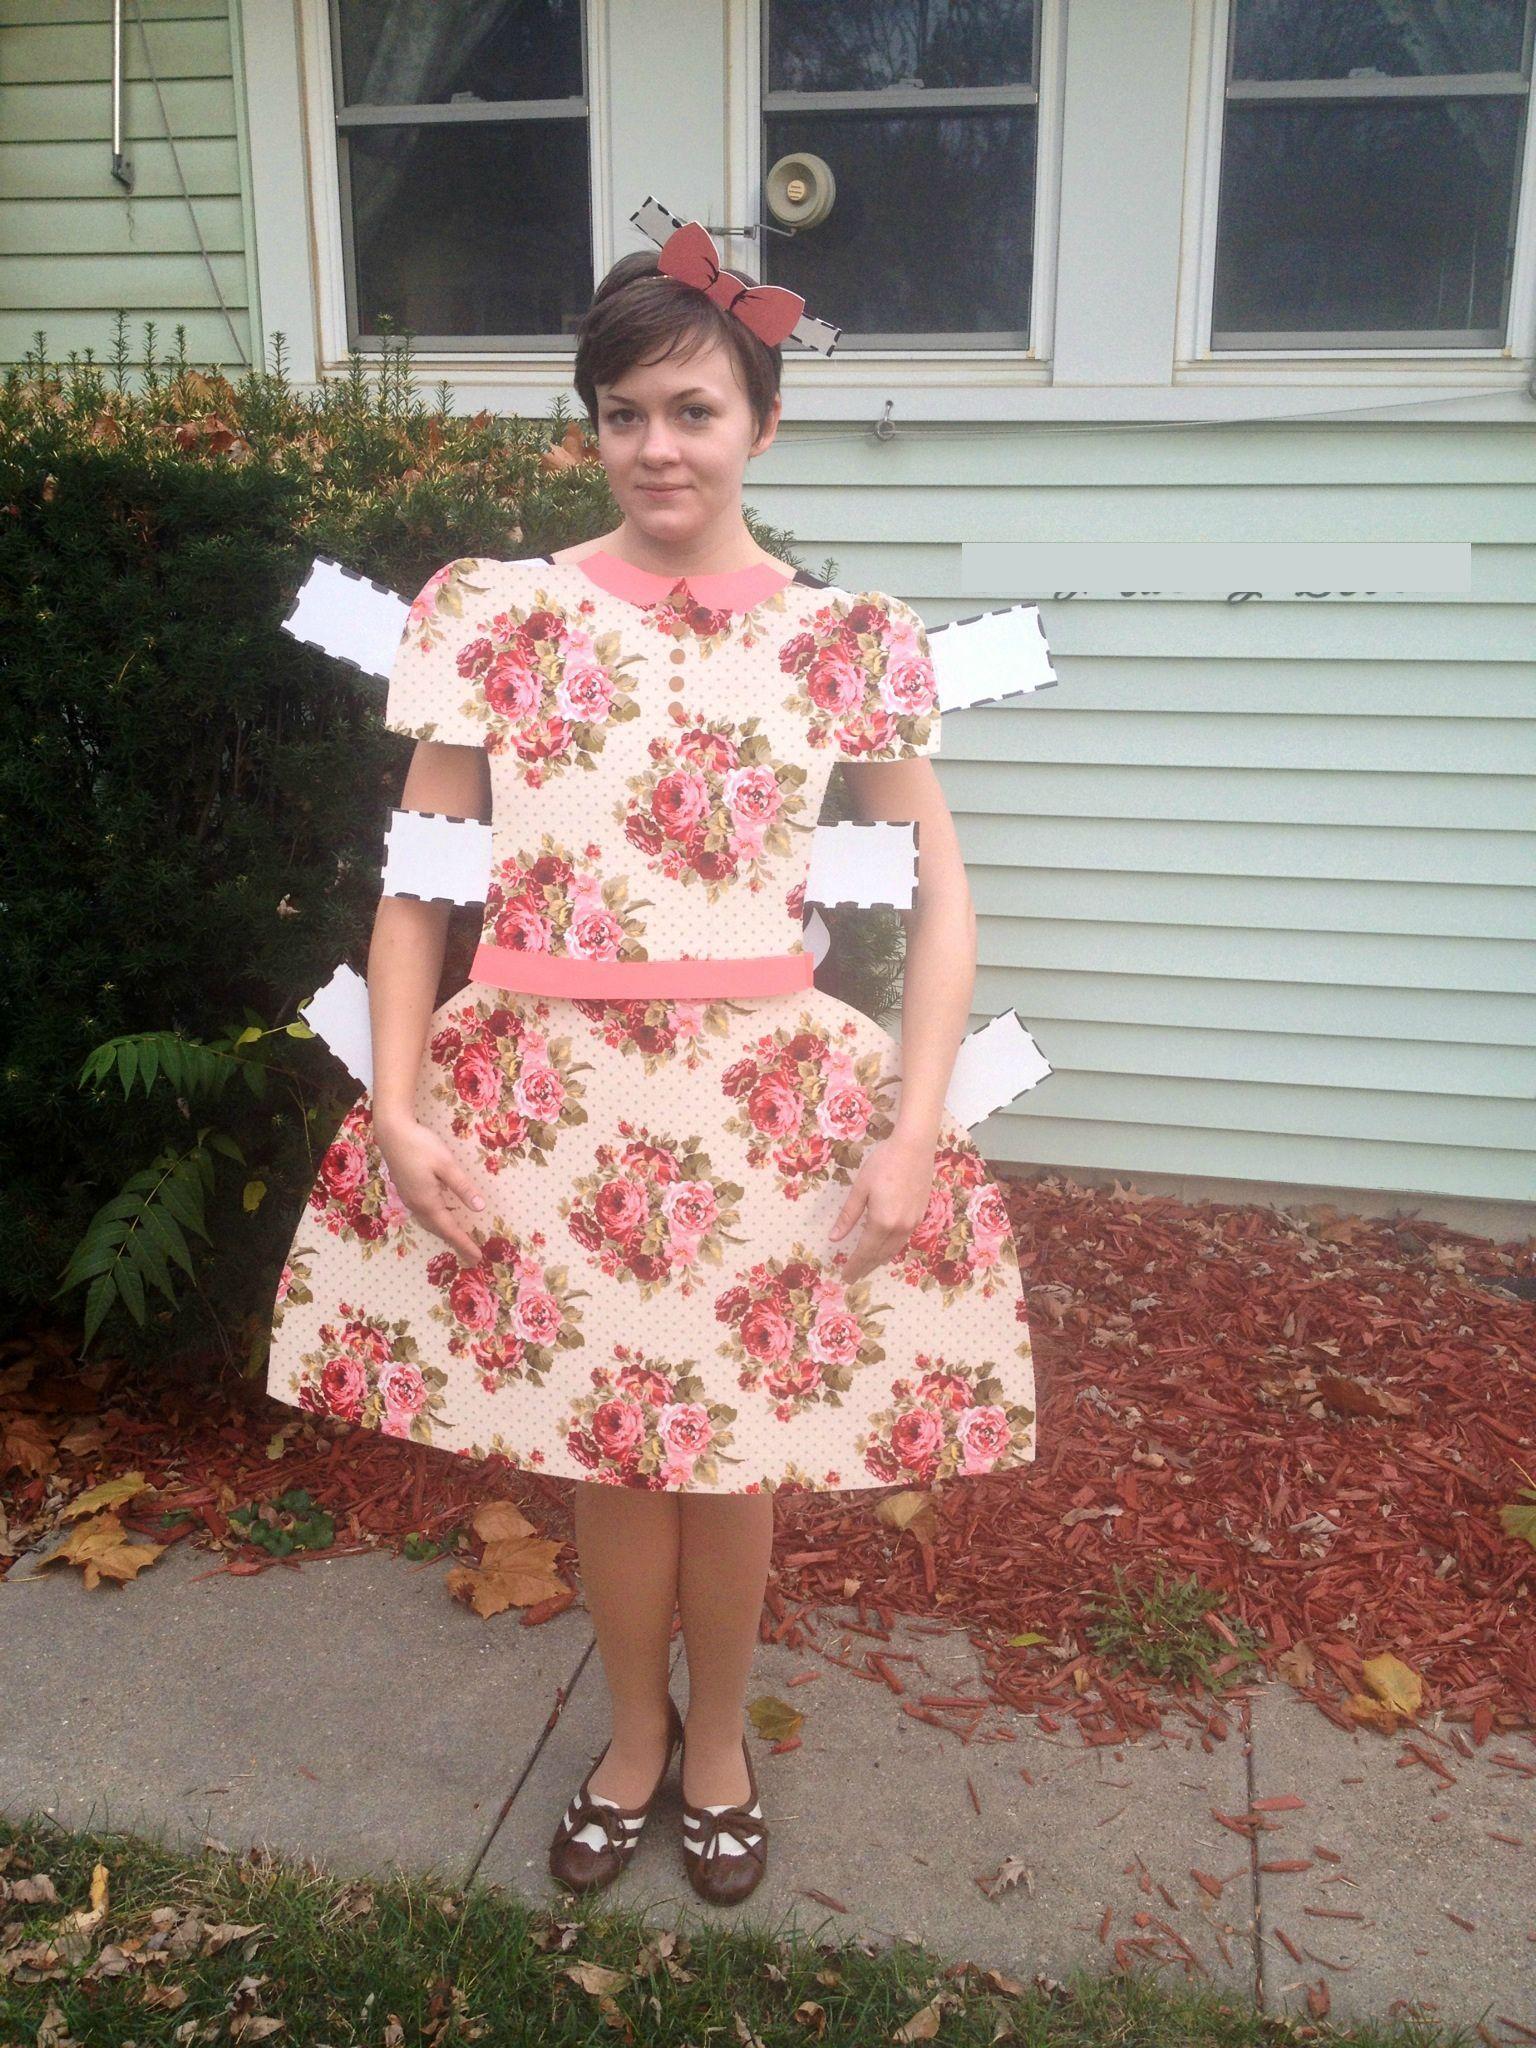 36 elaborate halloween costumes to make everyone jealous - How To Make A Doll Costume For Halloween